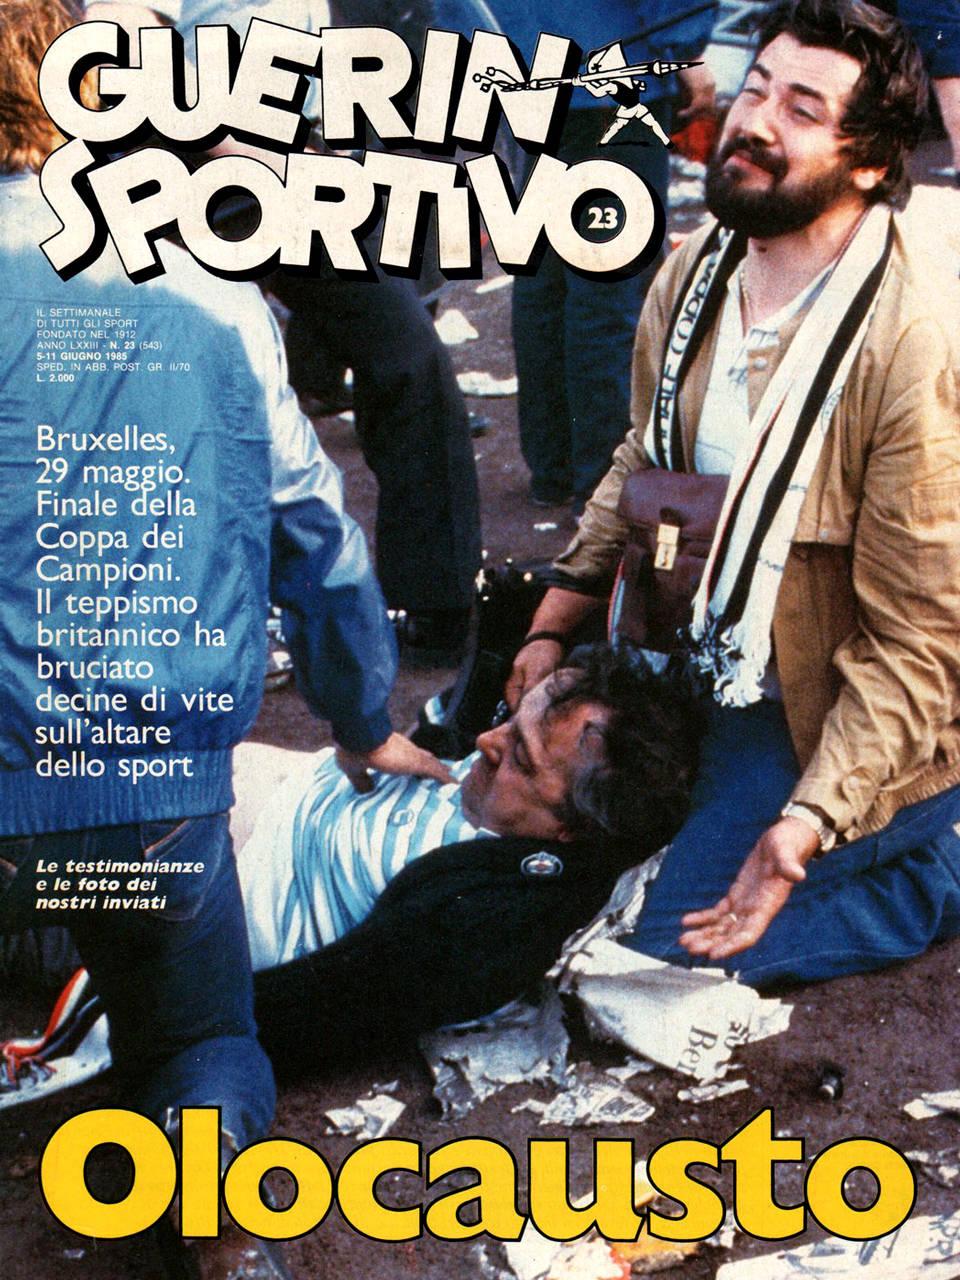 copertina guerin sportivo